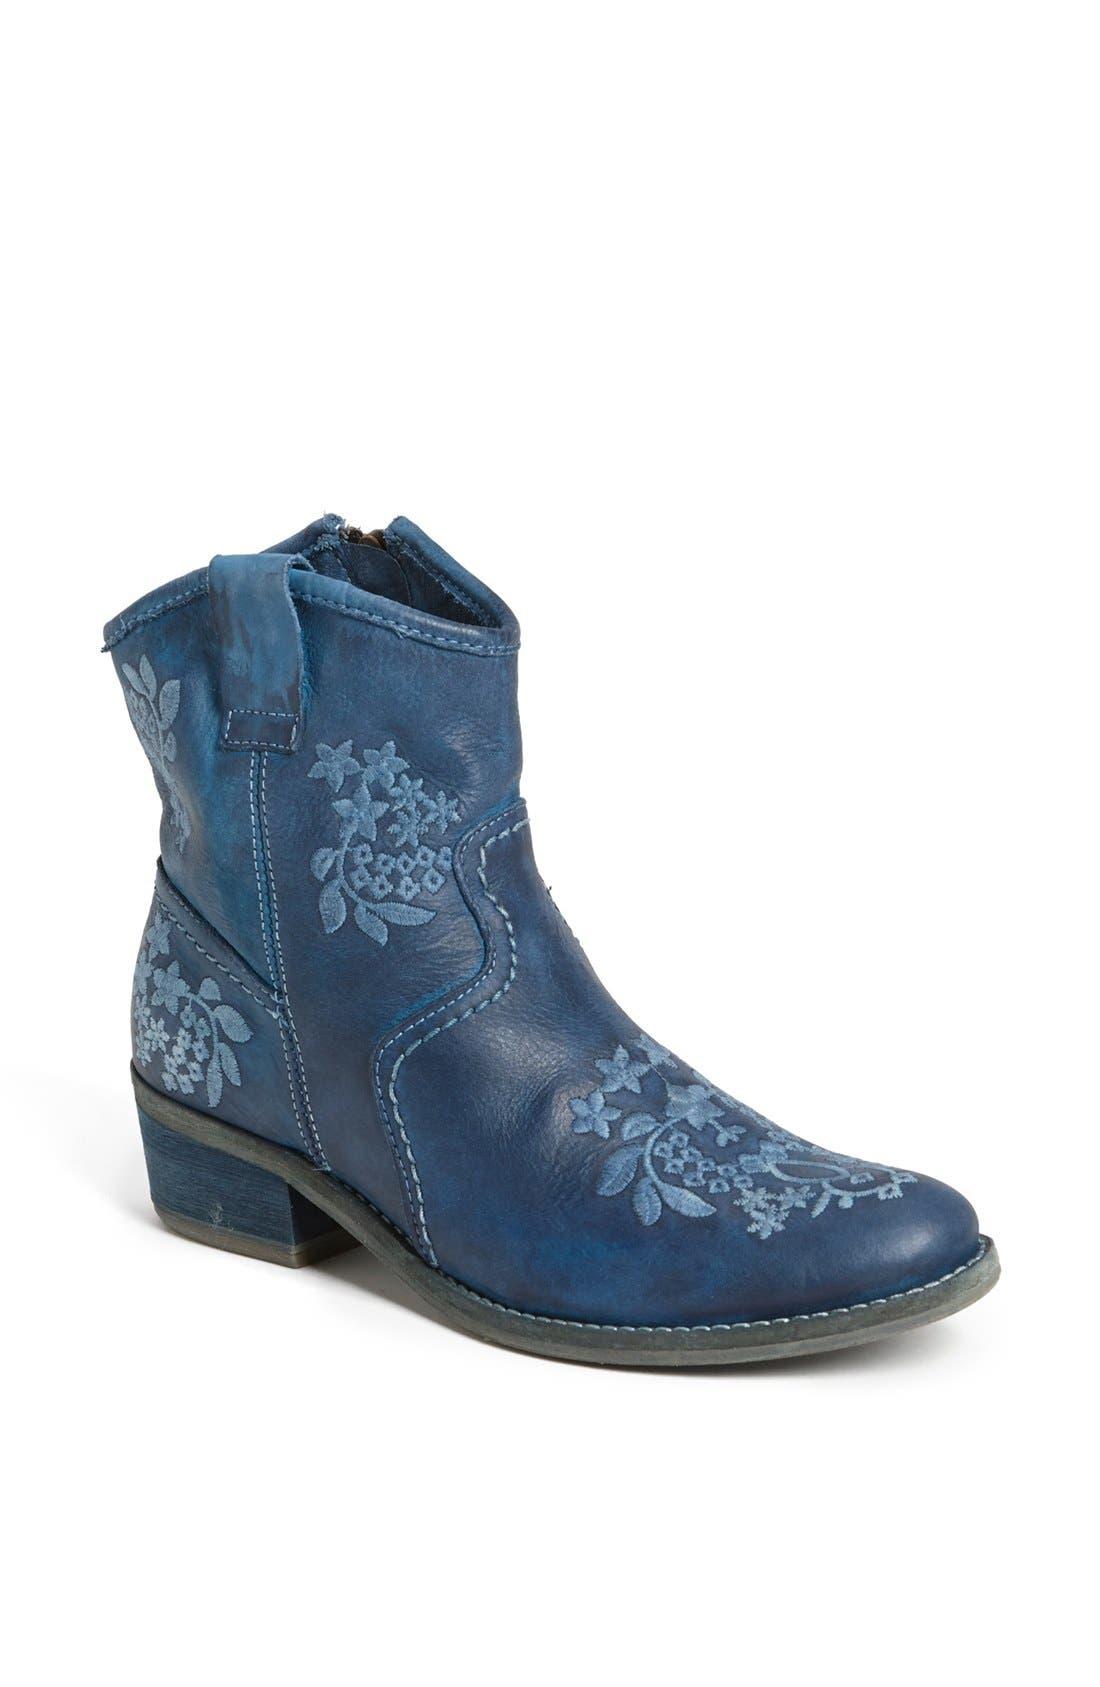 Alternate Image 1 Selected - Miz Mooz 'Leandra' Embroidered Leather Bootie